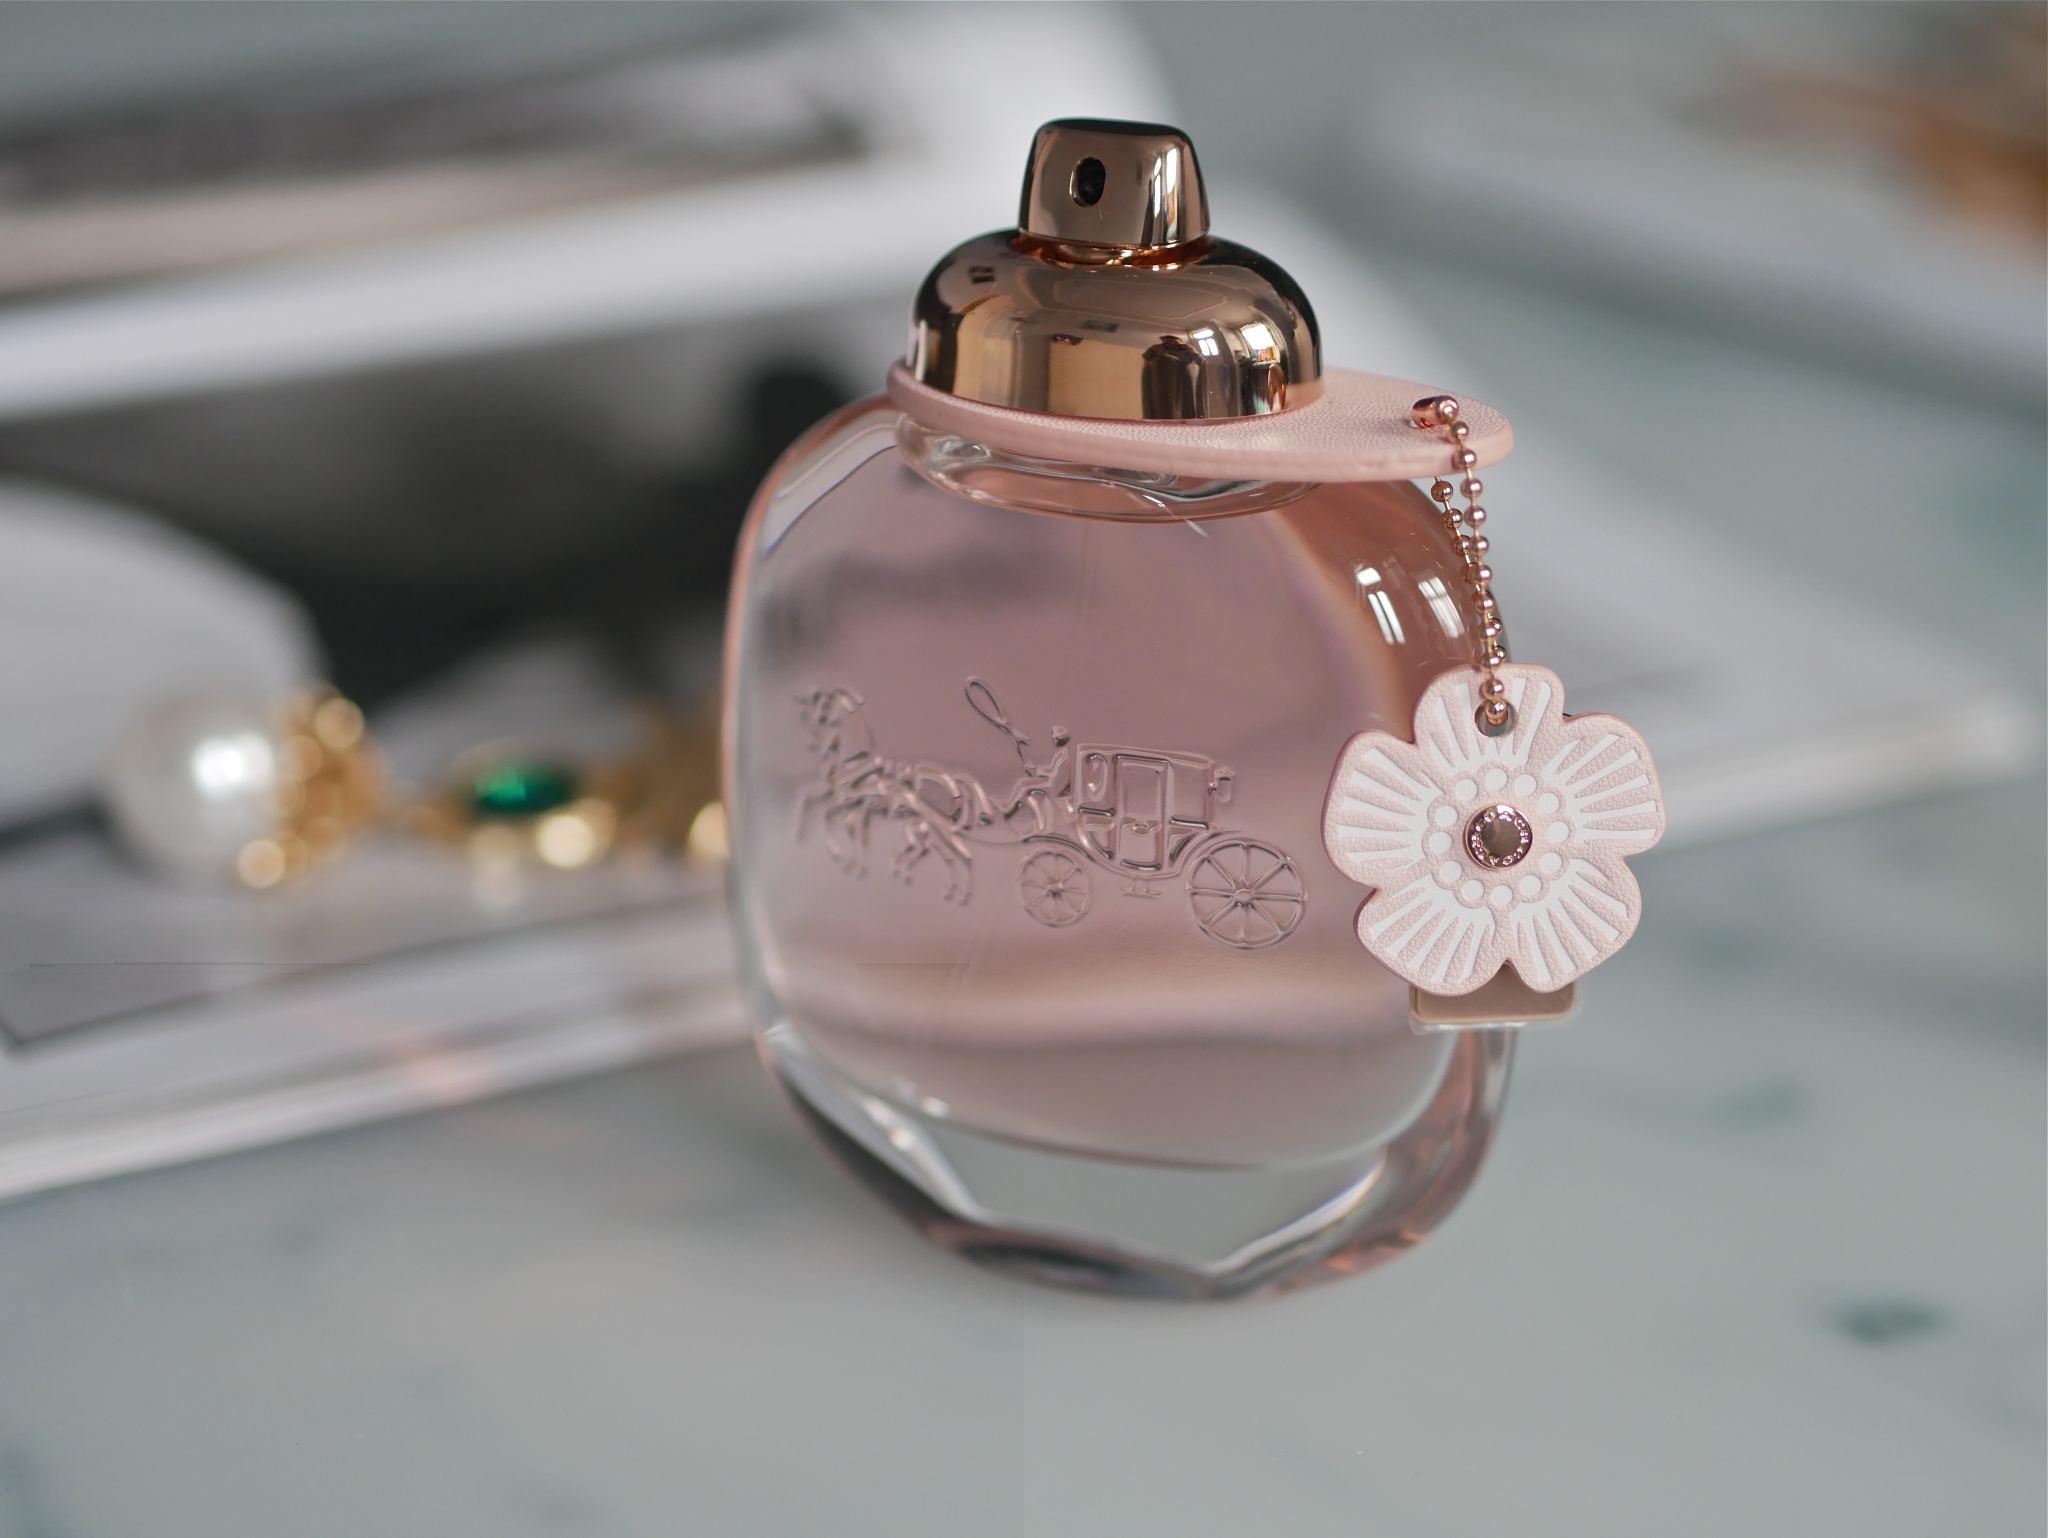 manchester blogger , perfumes, fragrances , manchester beauty blogger , manchester bloggers, manchester,alai a paris ,coach floral perfume, Issey Miyake Nectar parfume